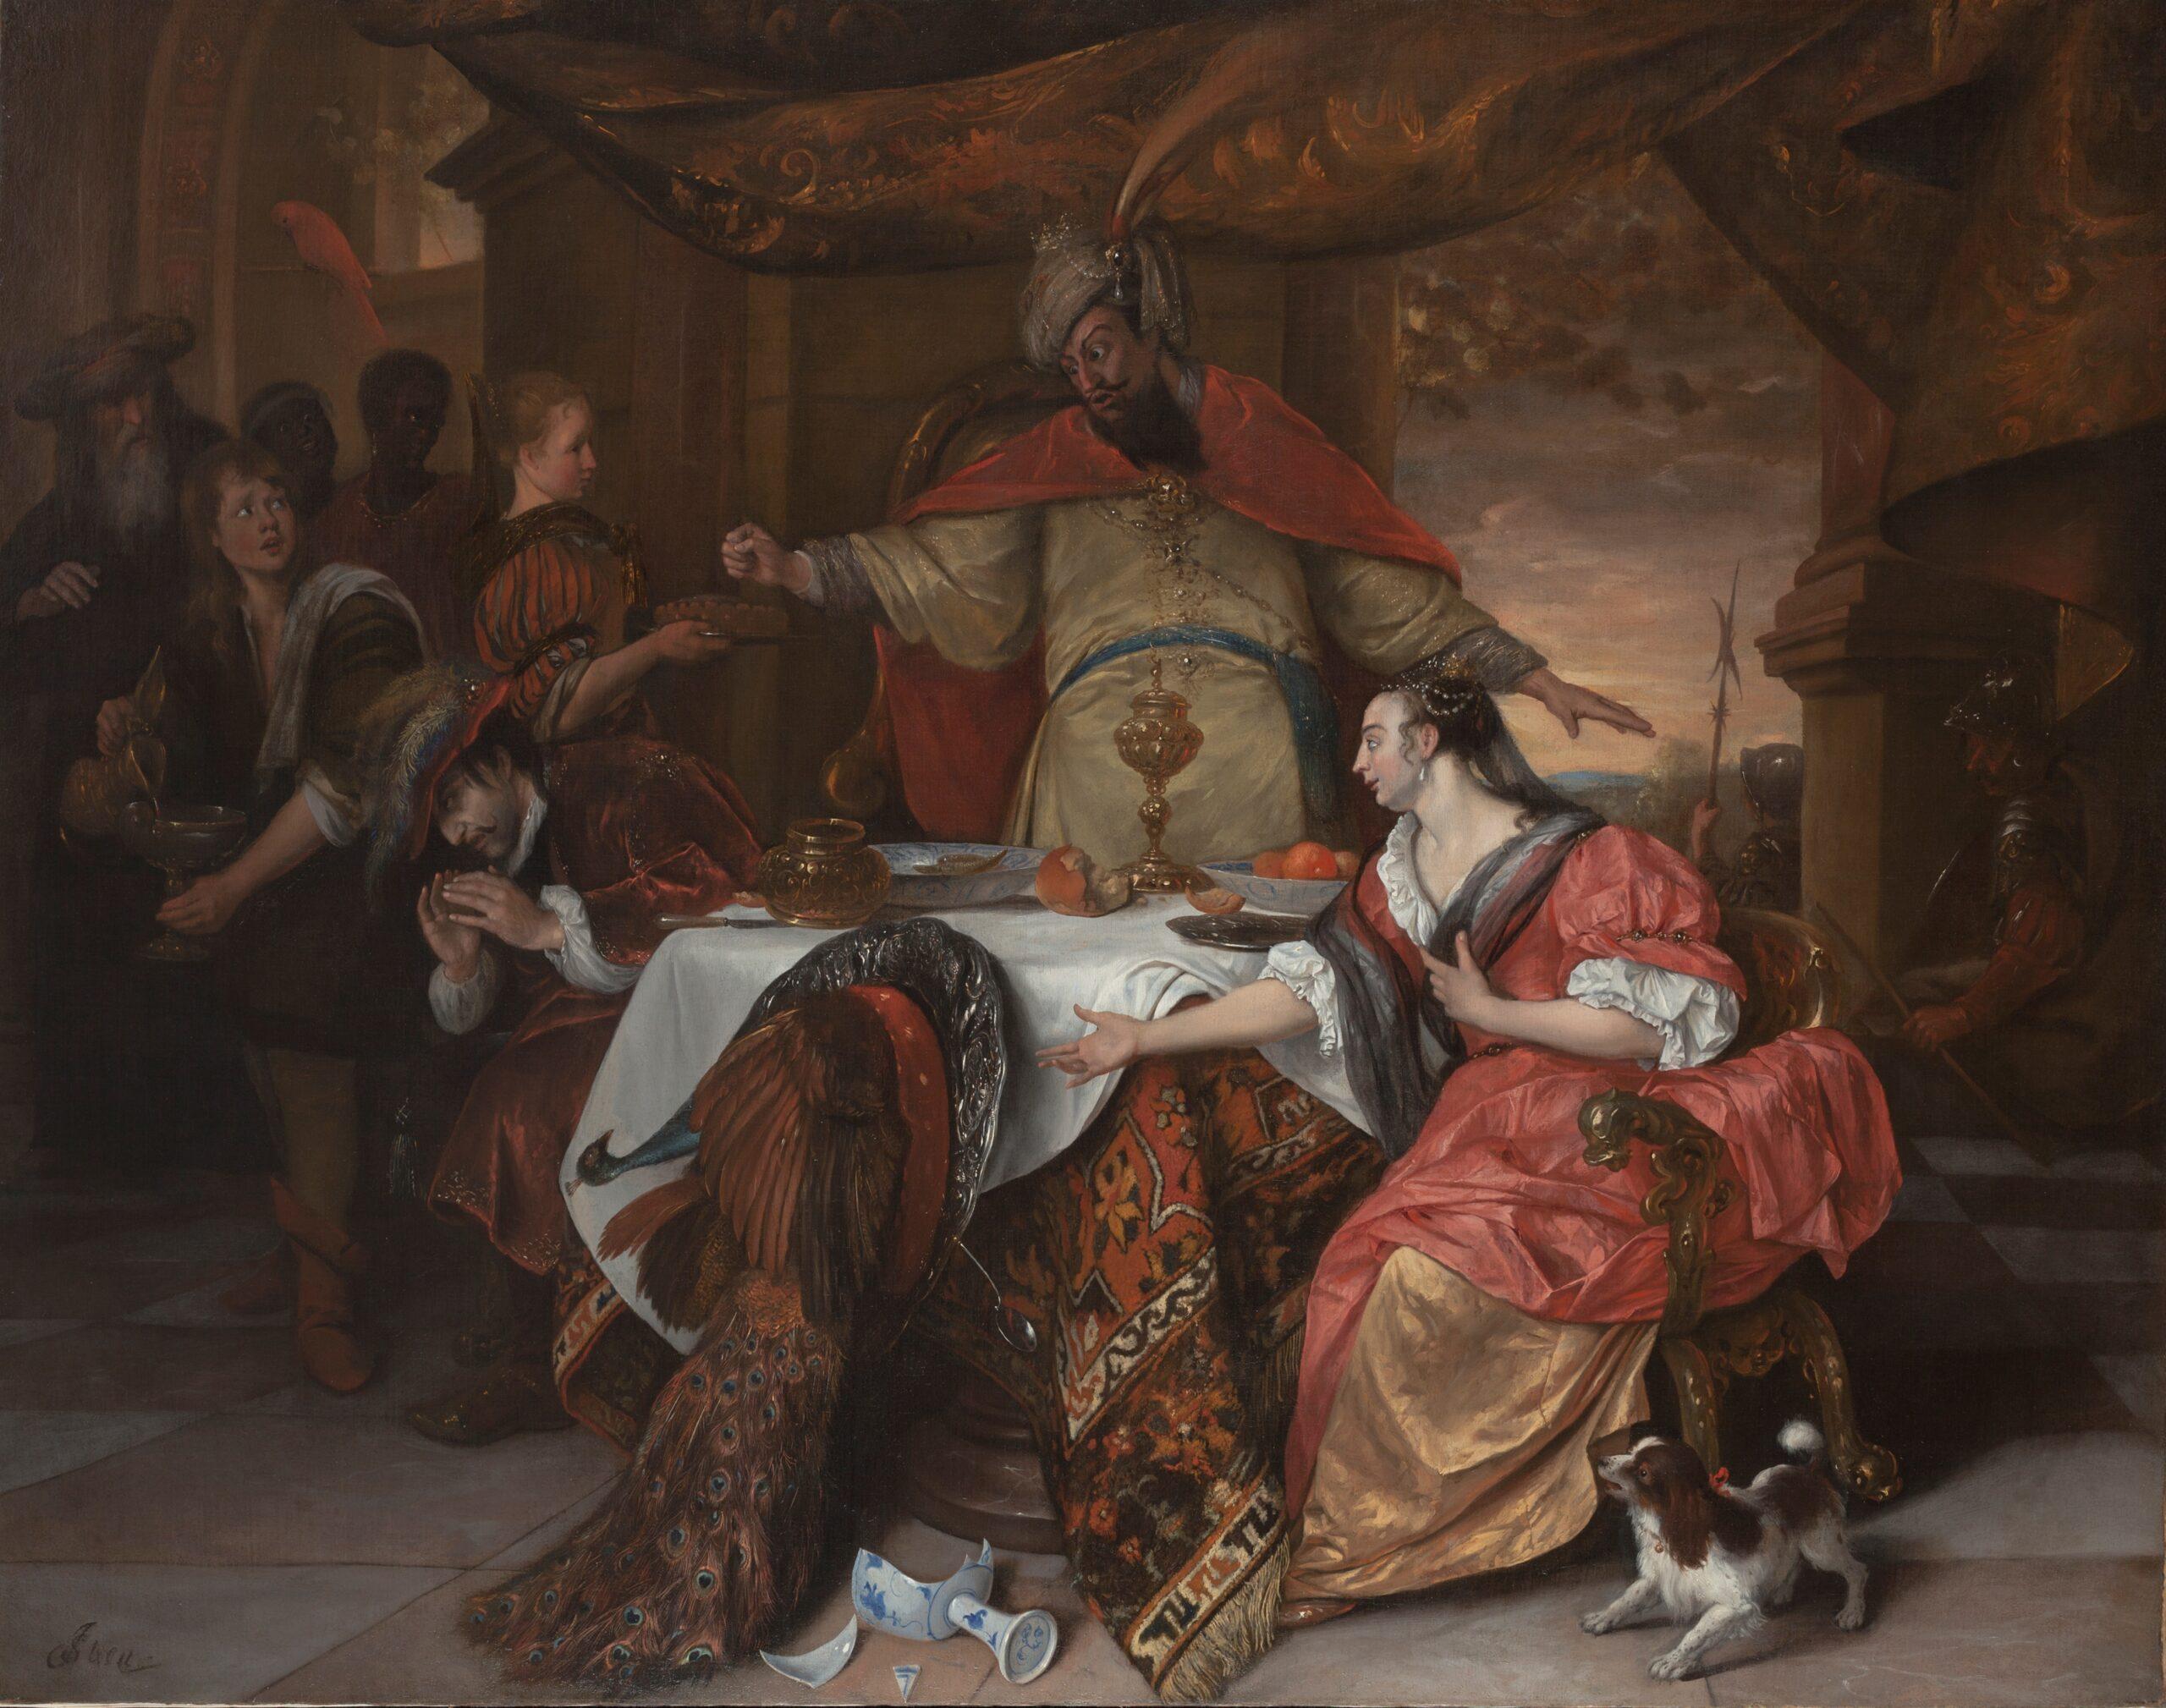 Jan Steen (1625/6-1679), <em>The Wrath of Ahasuerus</em>, ca. 1671-1673<br>© The Henry Barber Trust, The Barber Institute of Fine Arts, University of Birmingham